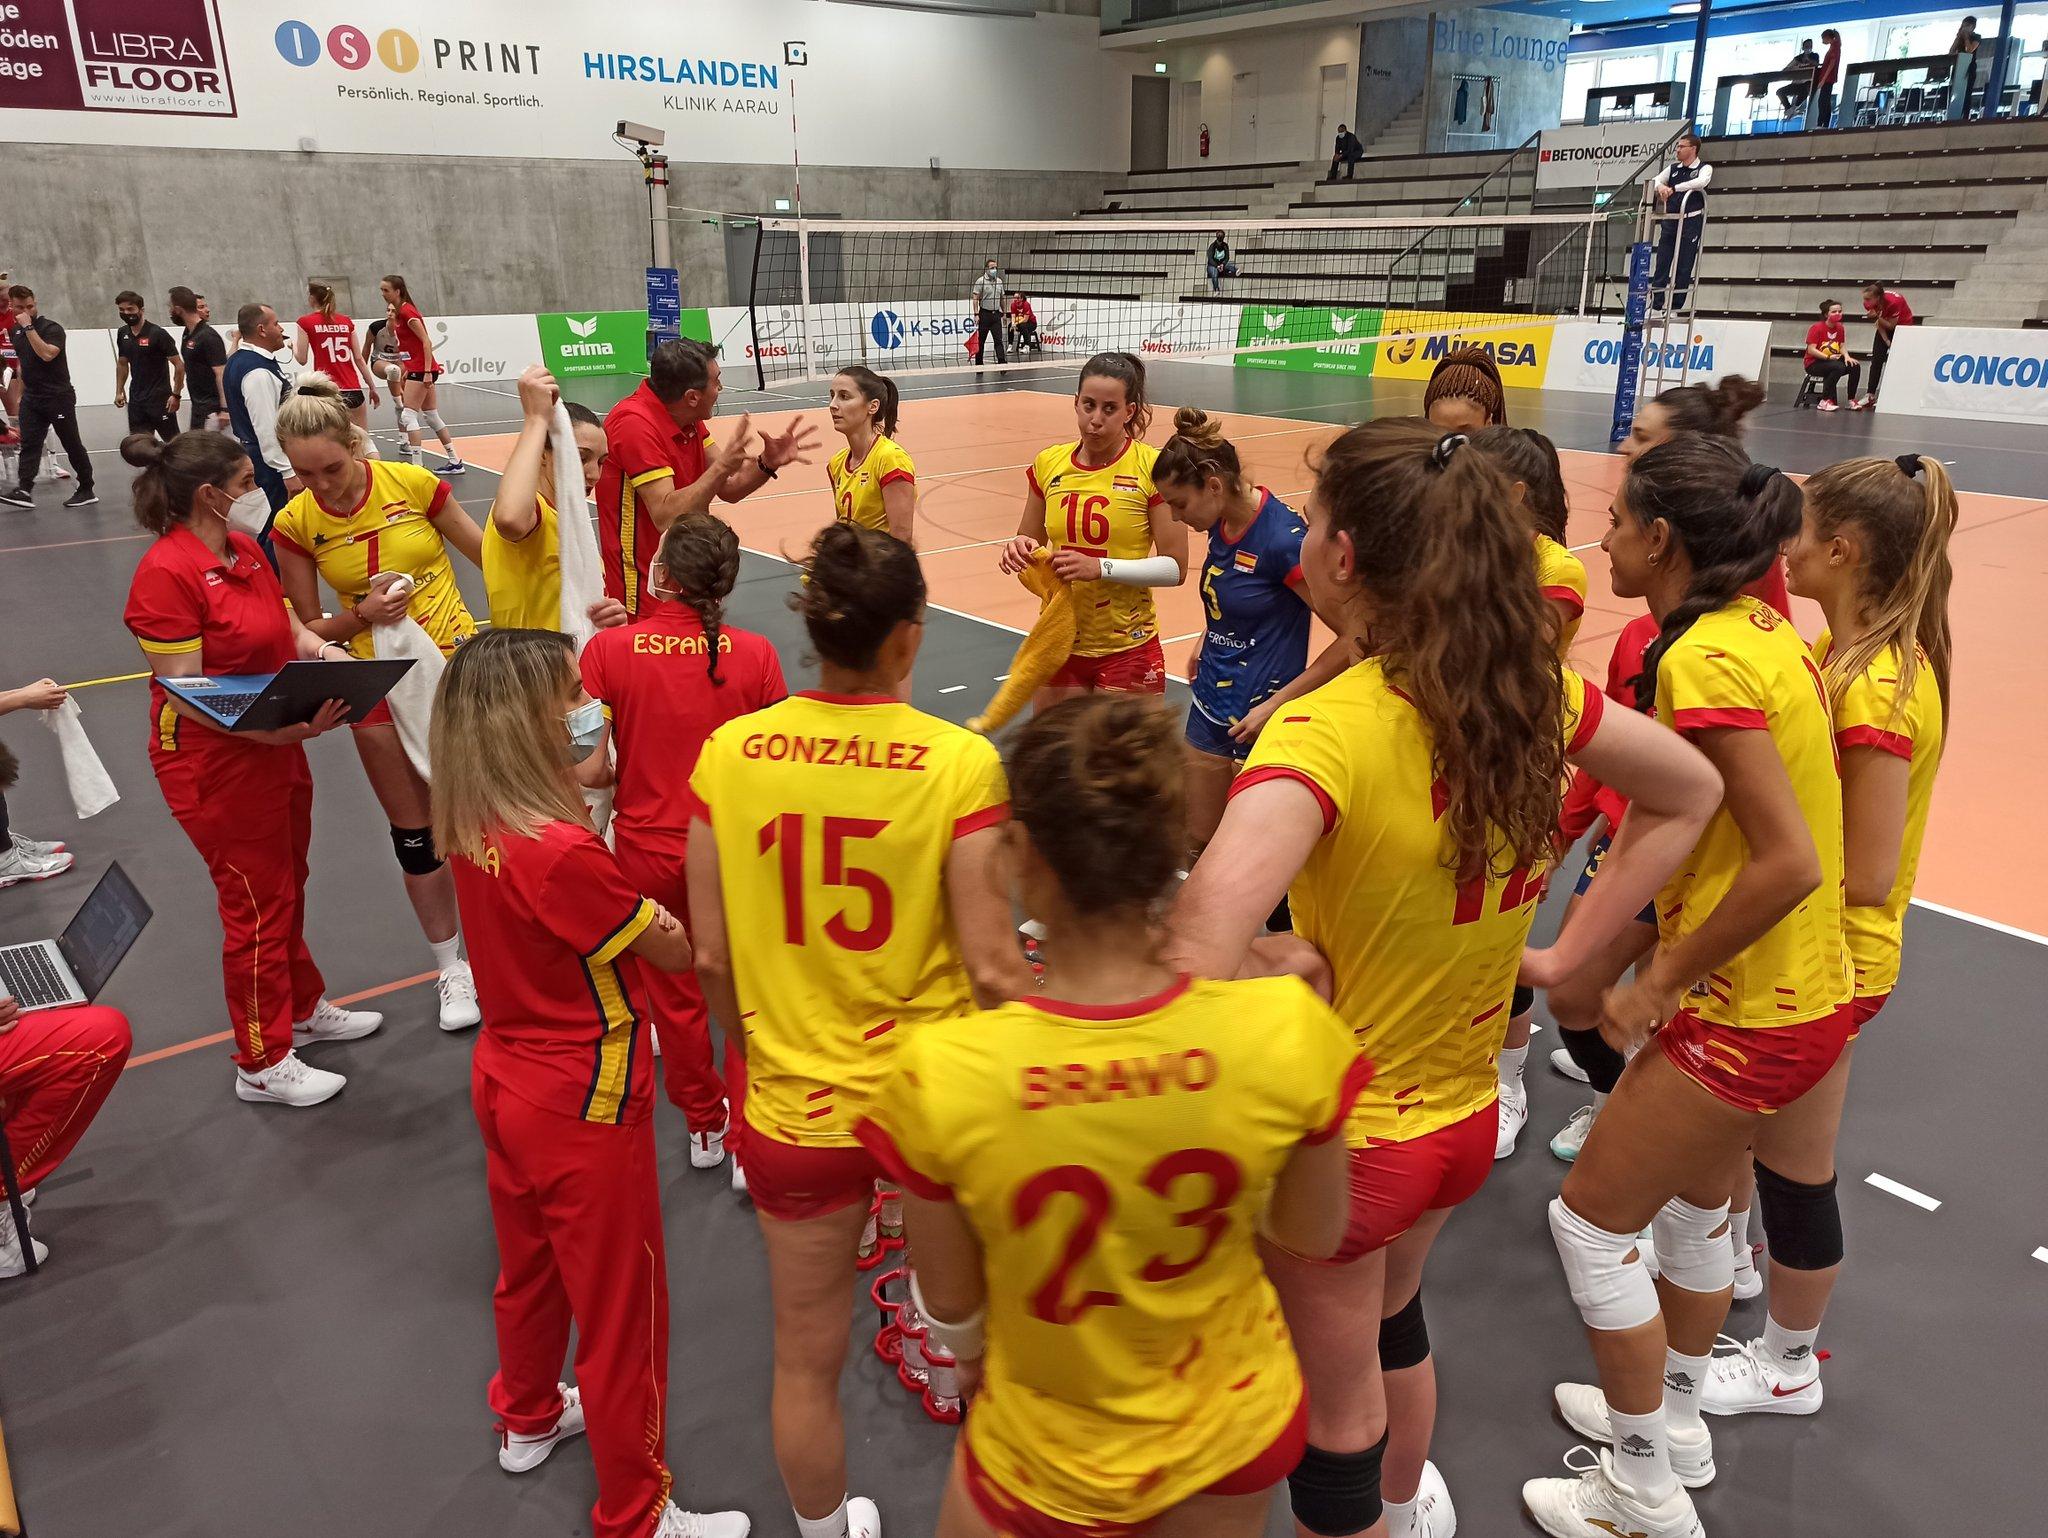 Selección Española - Selección Suíza / RFEVB